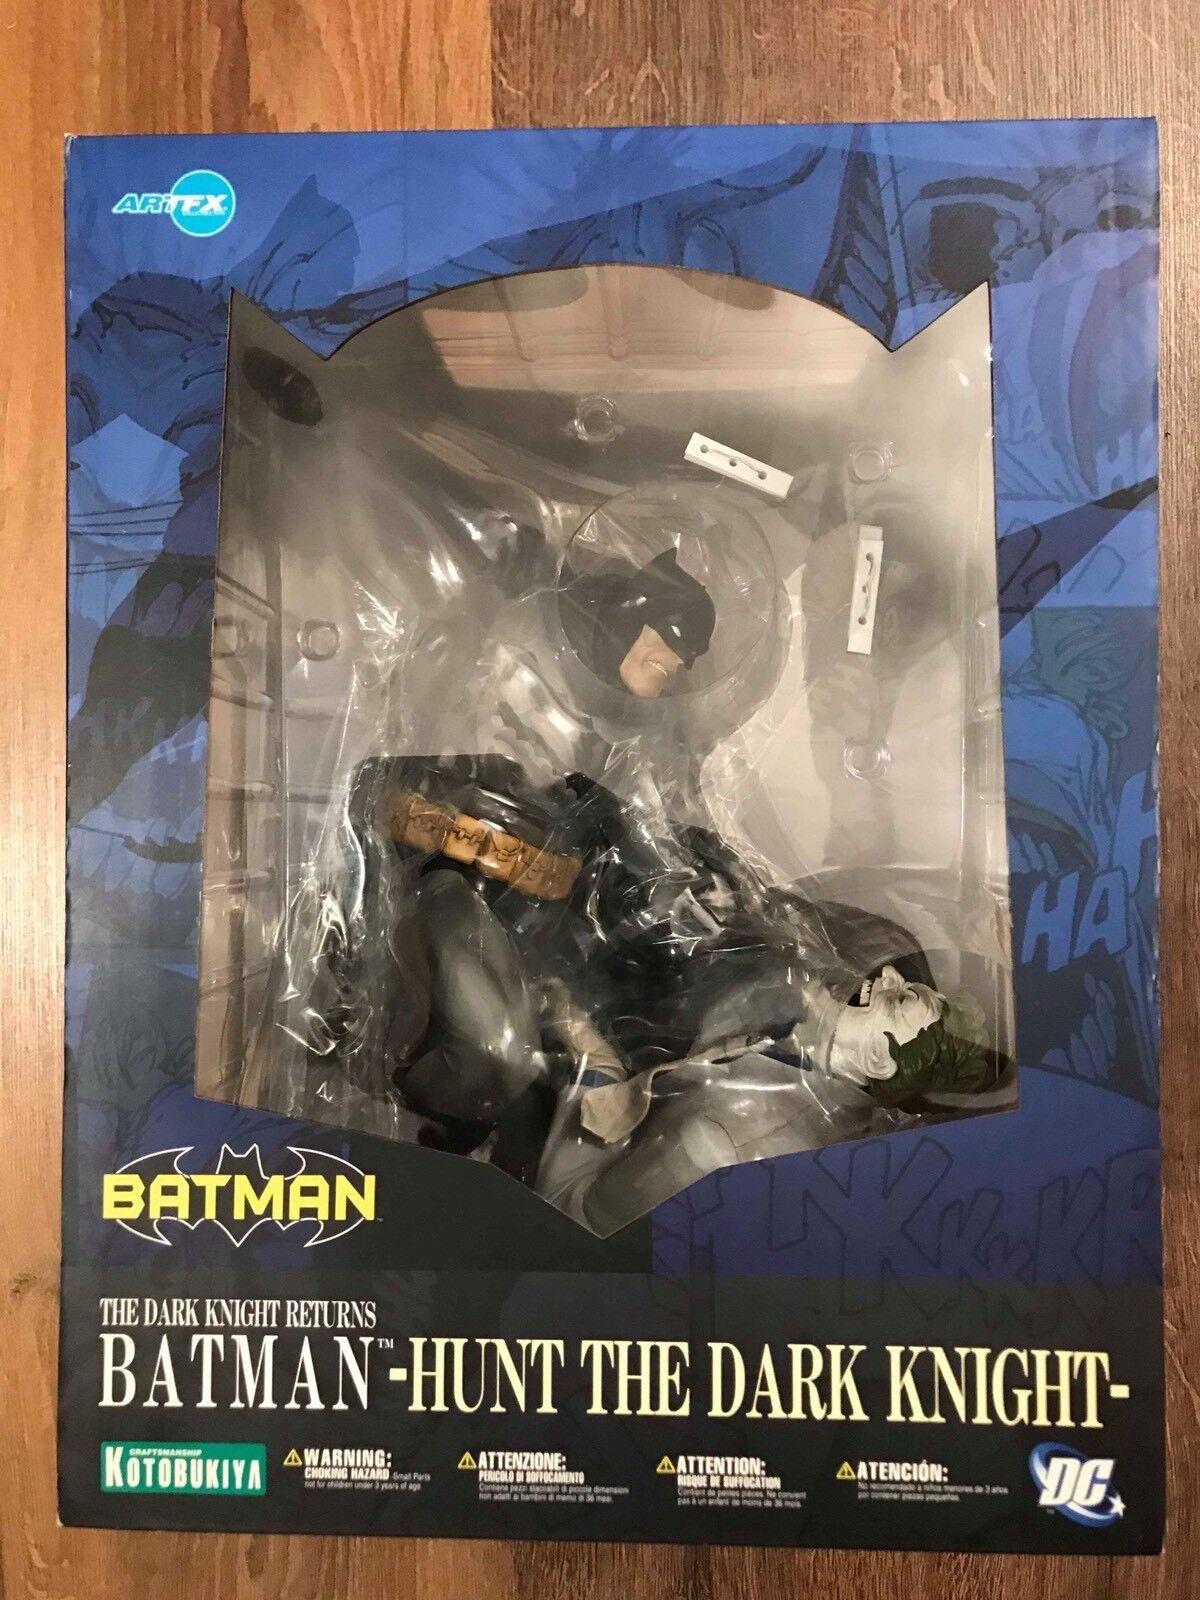 Kotobukiya ArtFX Statue  The Dark Knight Returns  Batuomo  -Hunt The Dark Knight-  Prezzo al piano